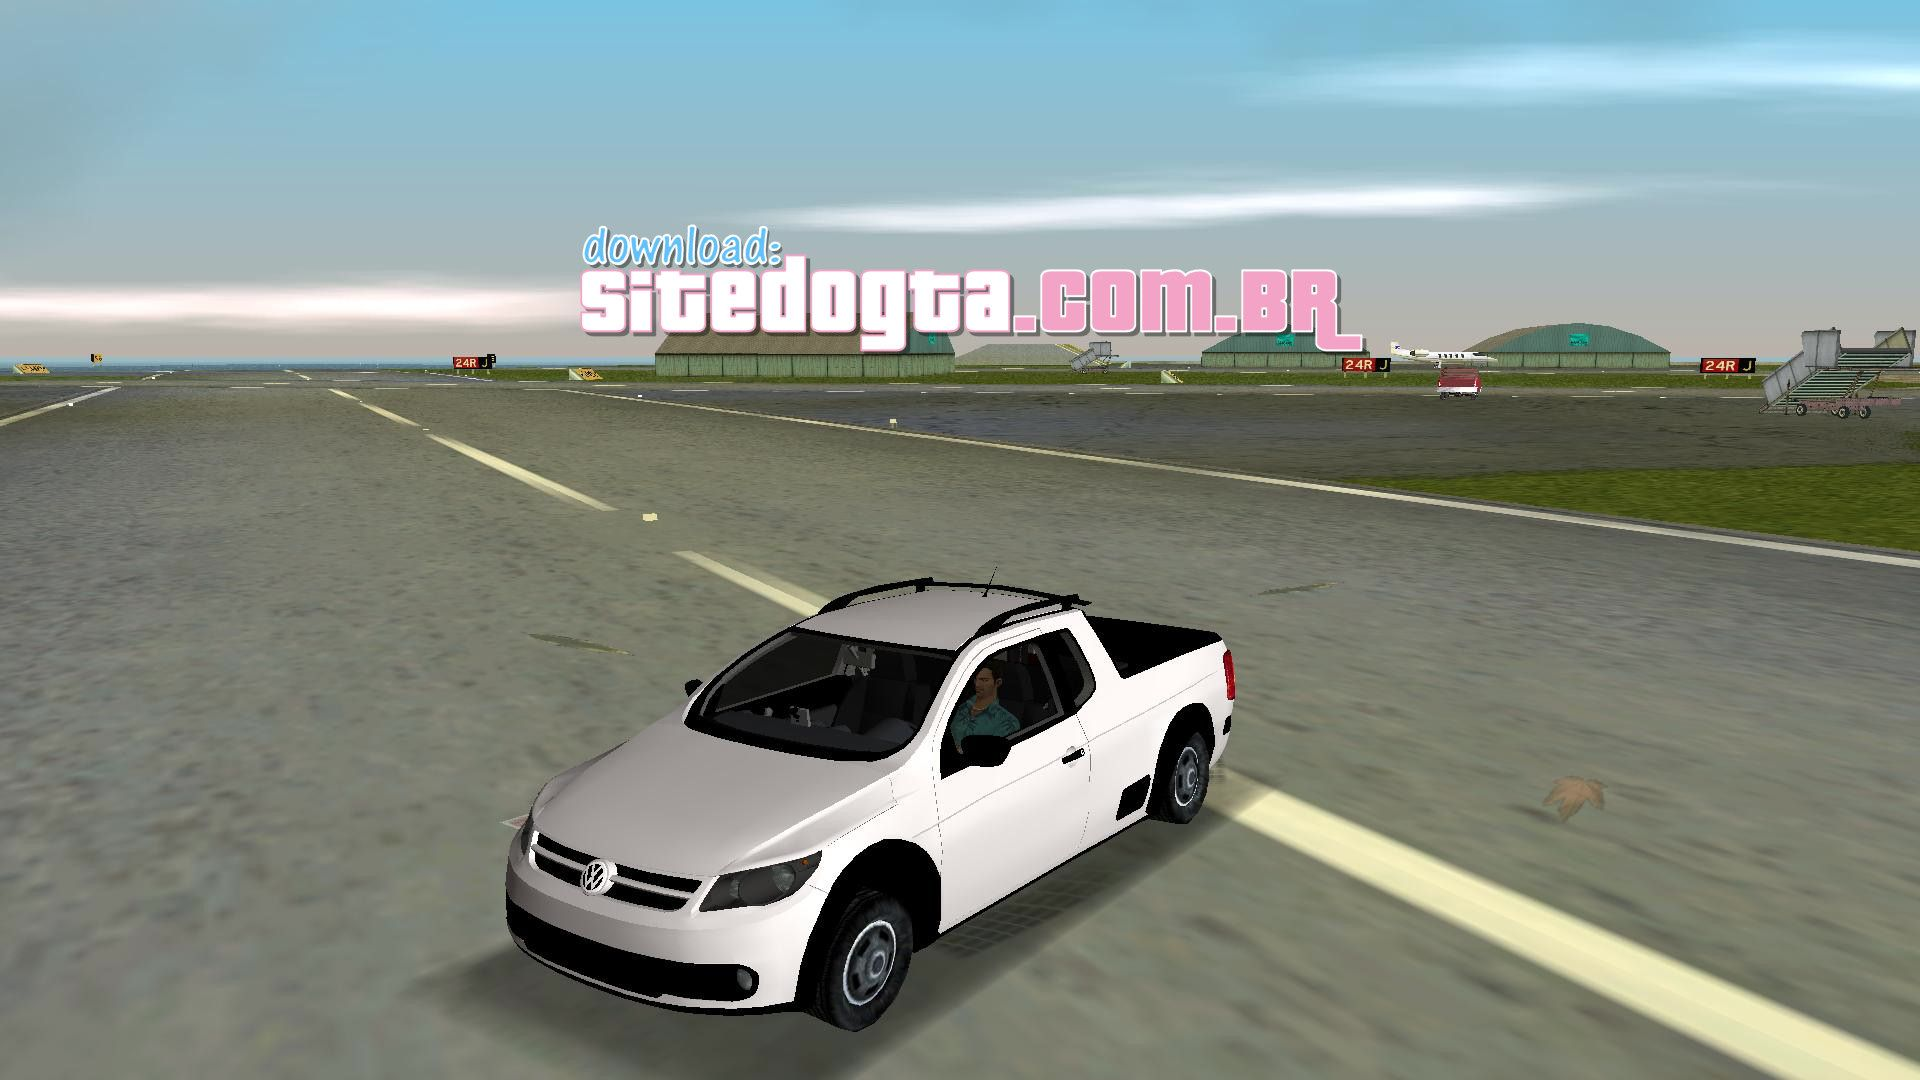 Index Of Vice City Imagens Veiculos Carros Brasileiros Volkswagen